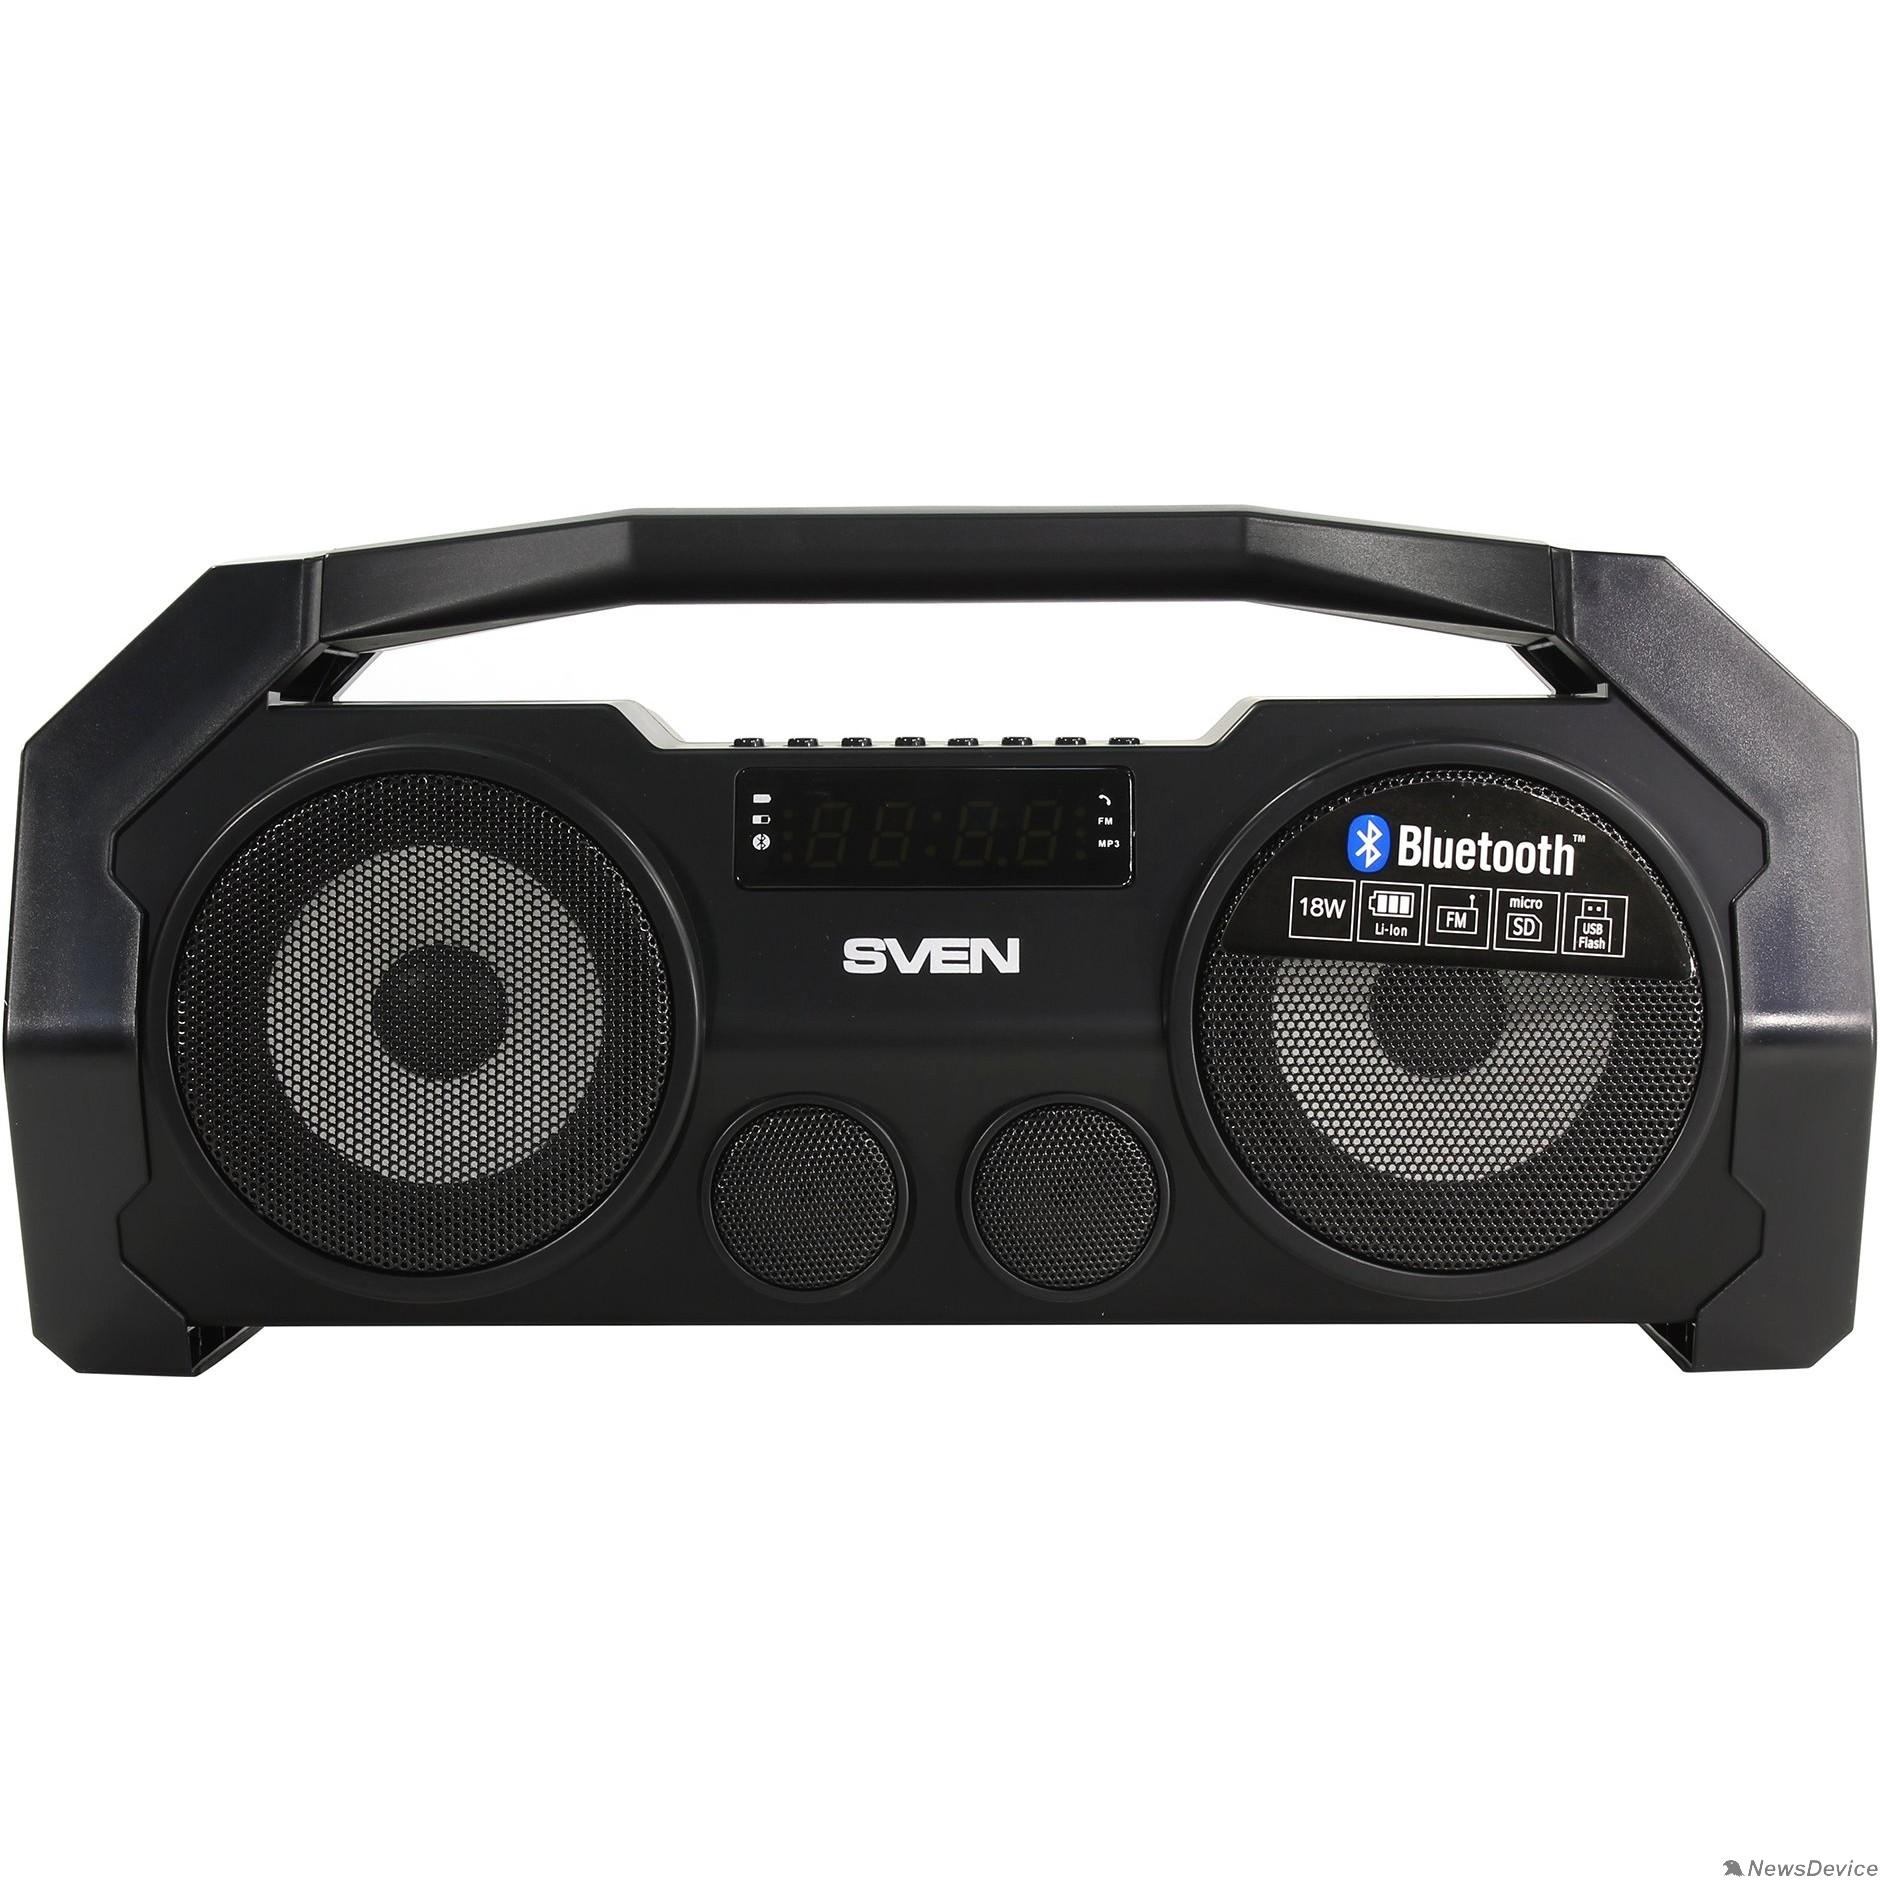 Колонки SVEN PS-465, черный (18 Вт, Bluetooth, FM, USB, microSD, LED-дисплей, 1800мА*ч)